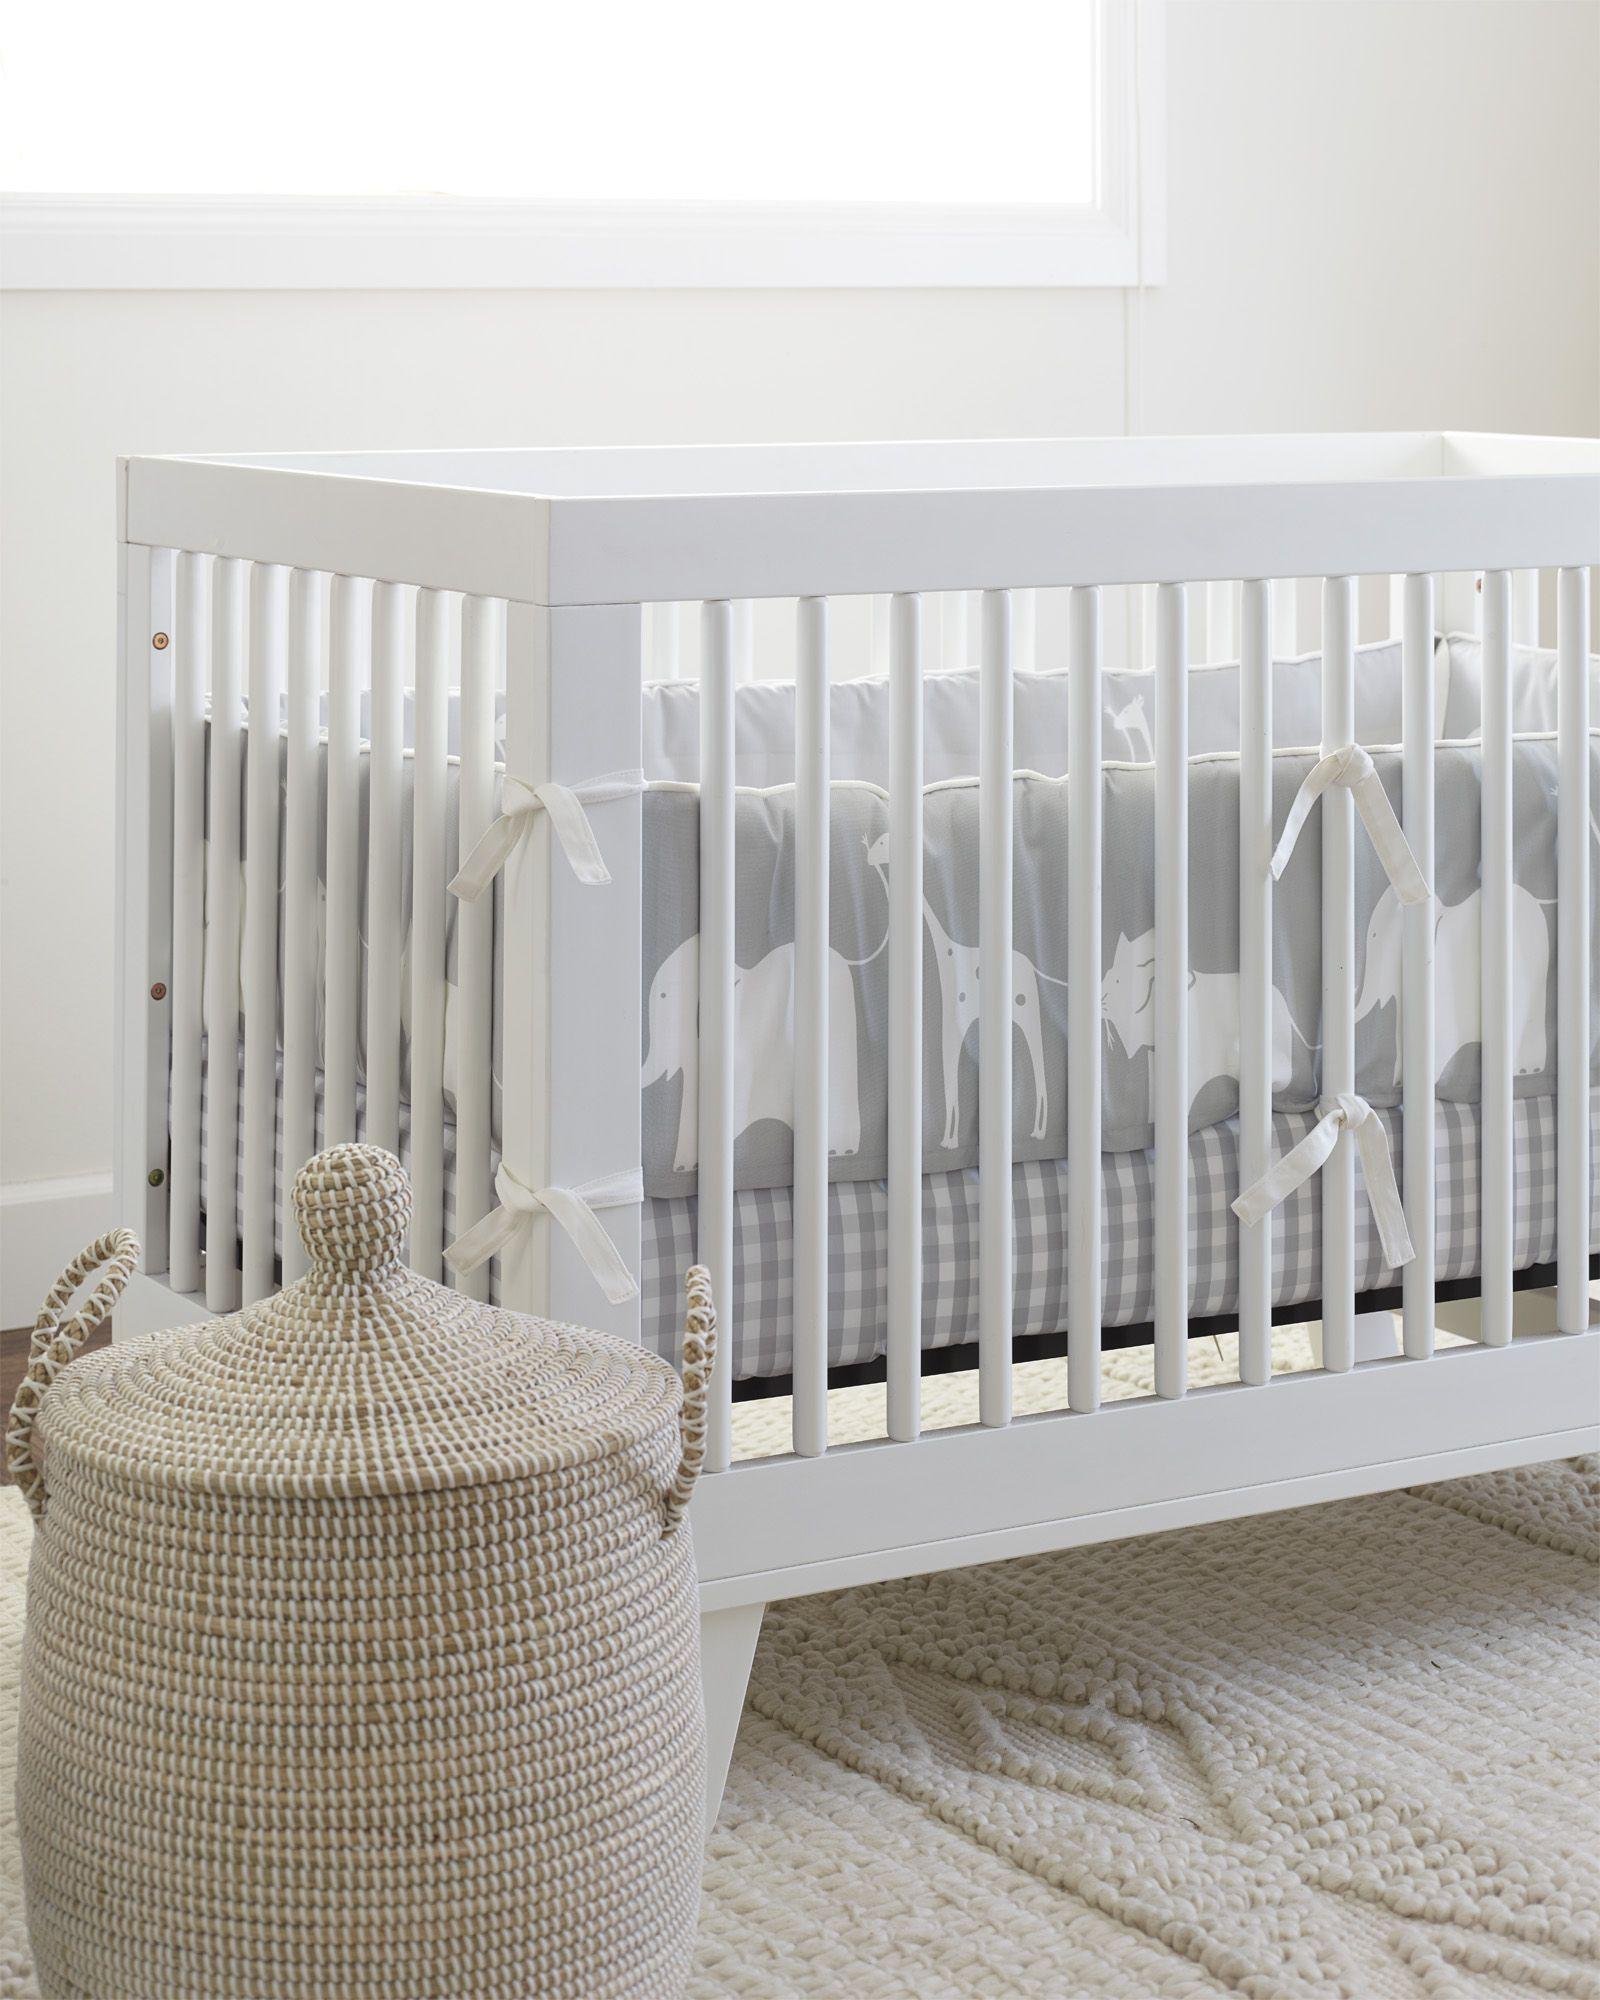 A Fun Way To Design Your Gender Neutral Nursery Gingham Crib Sheet Via Serena Lily